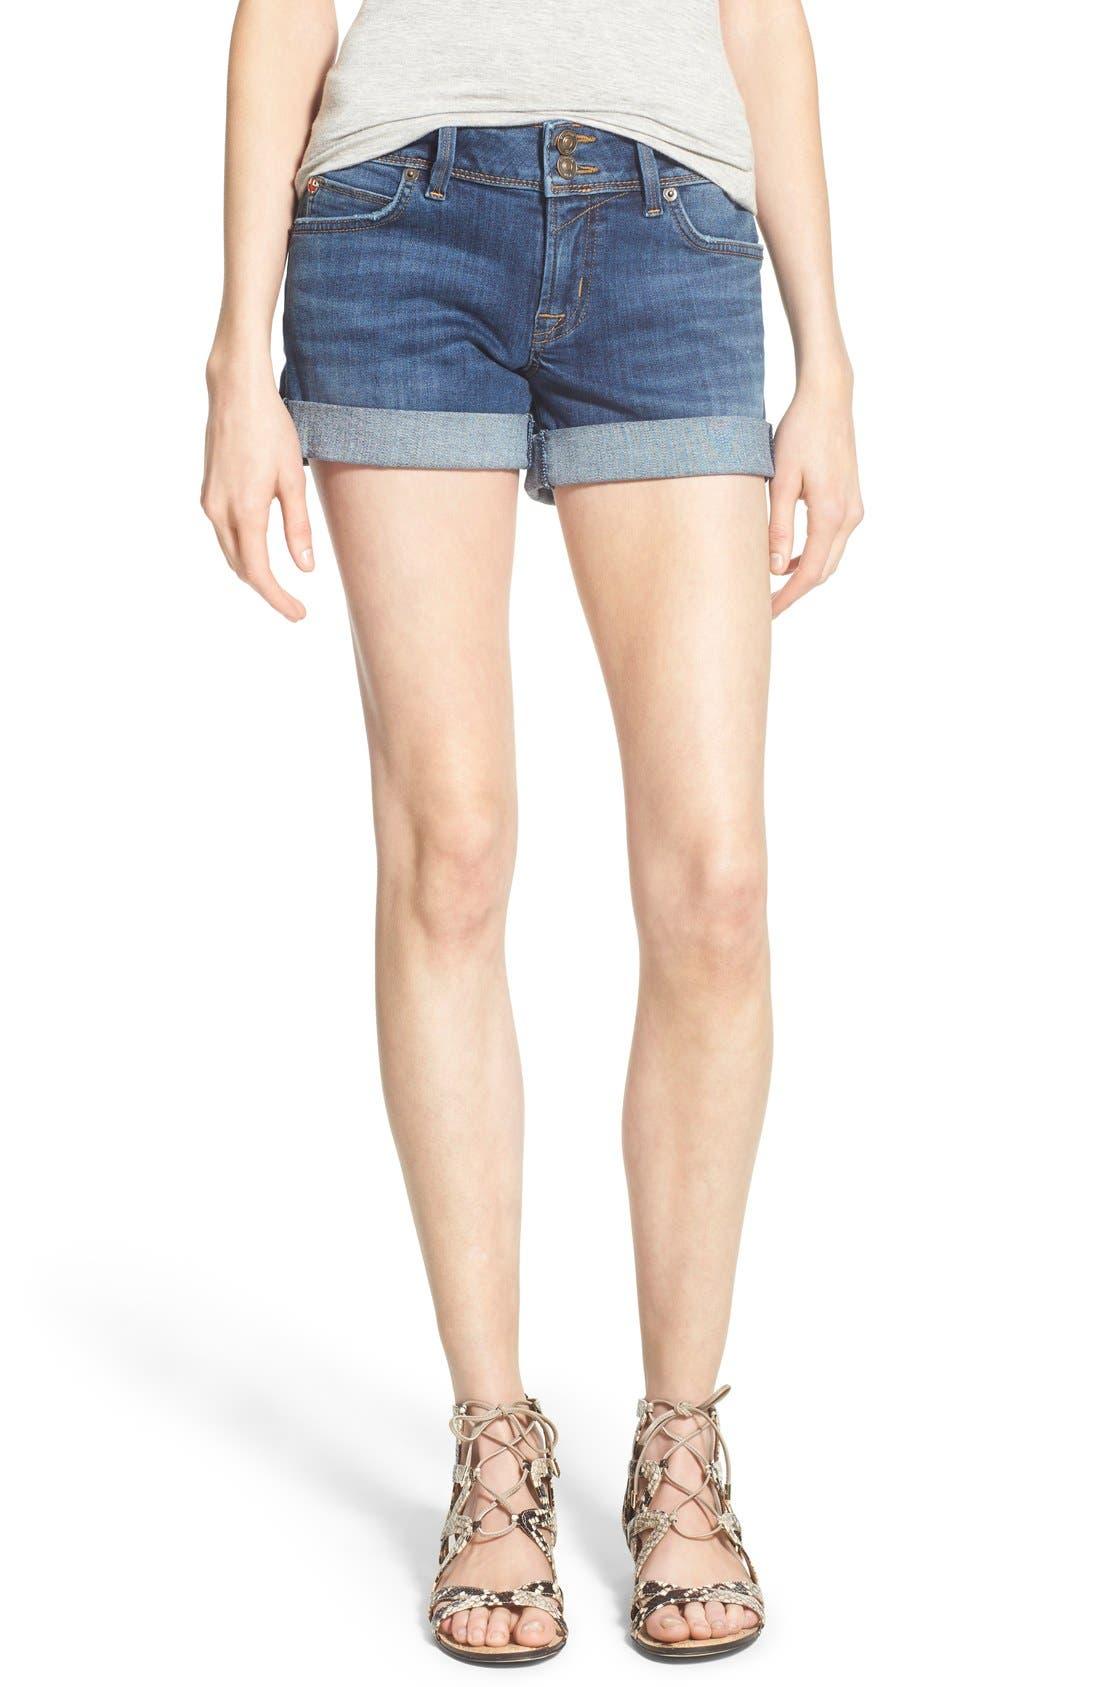 'Croxley' Cuffed Denim Shorts,                             Main thumbnail 1, color,                             Advantageous